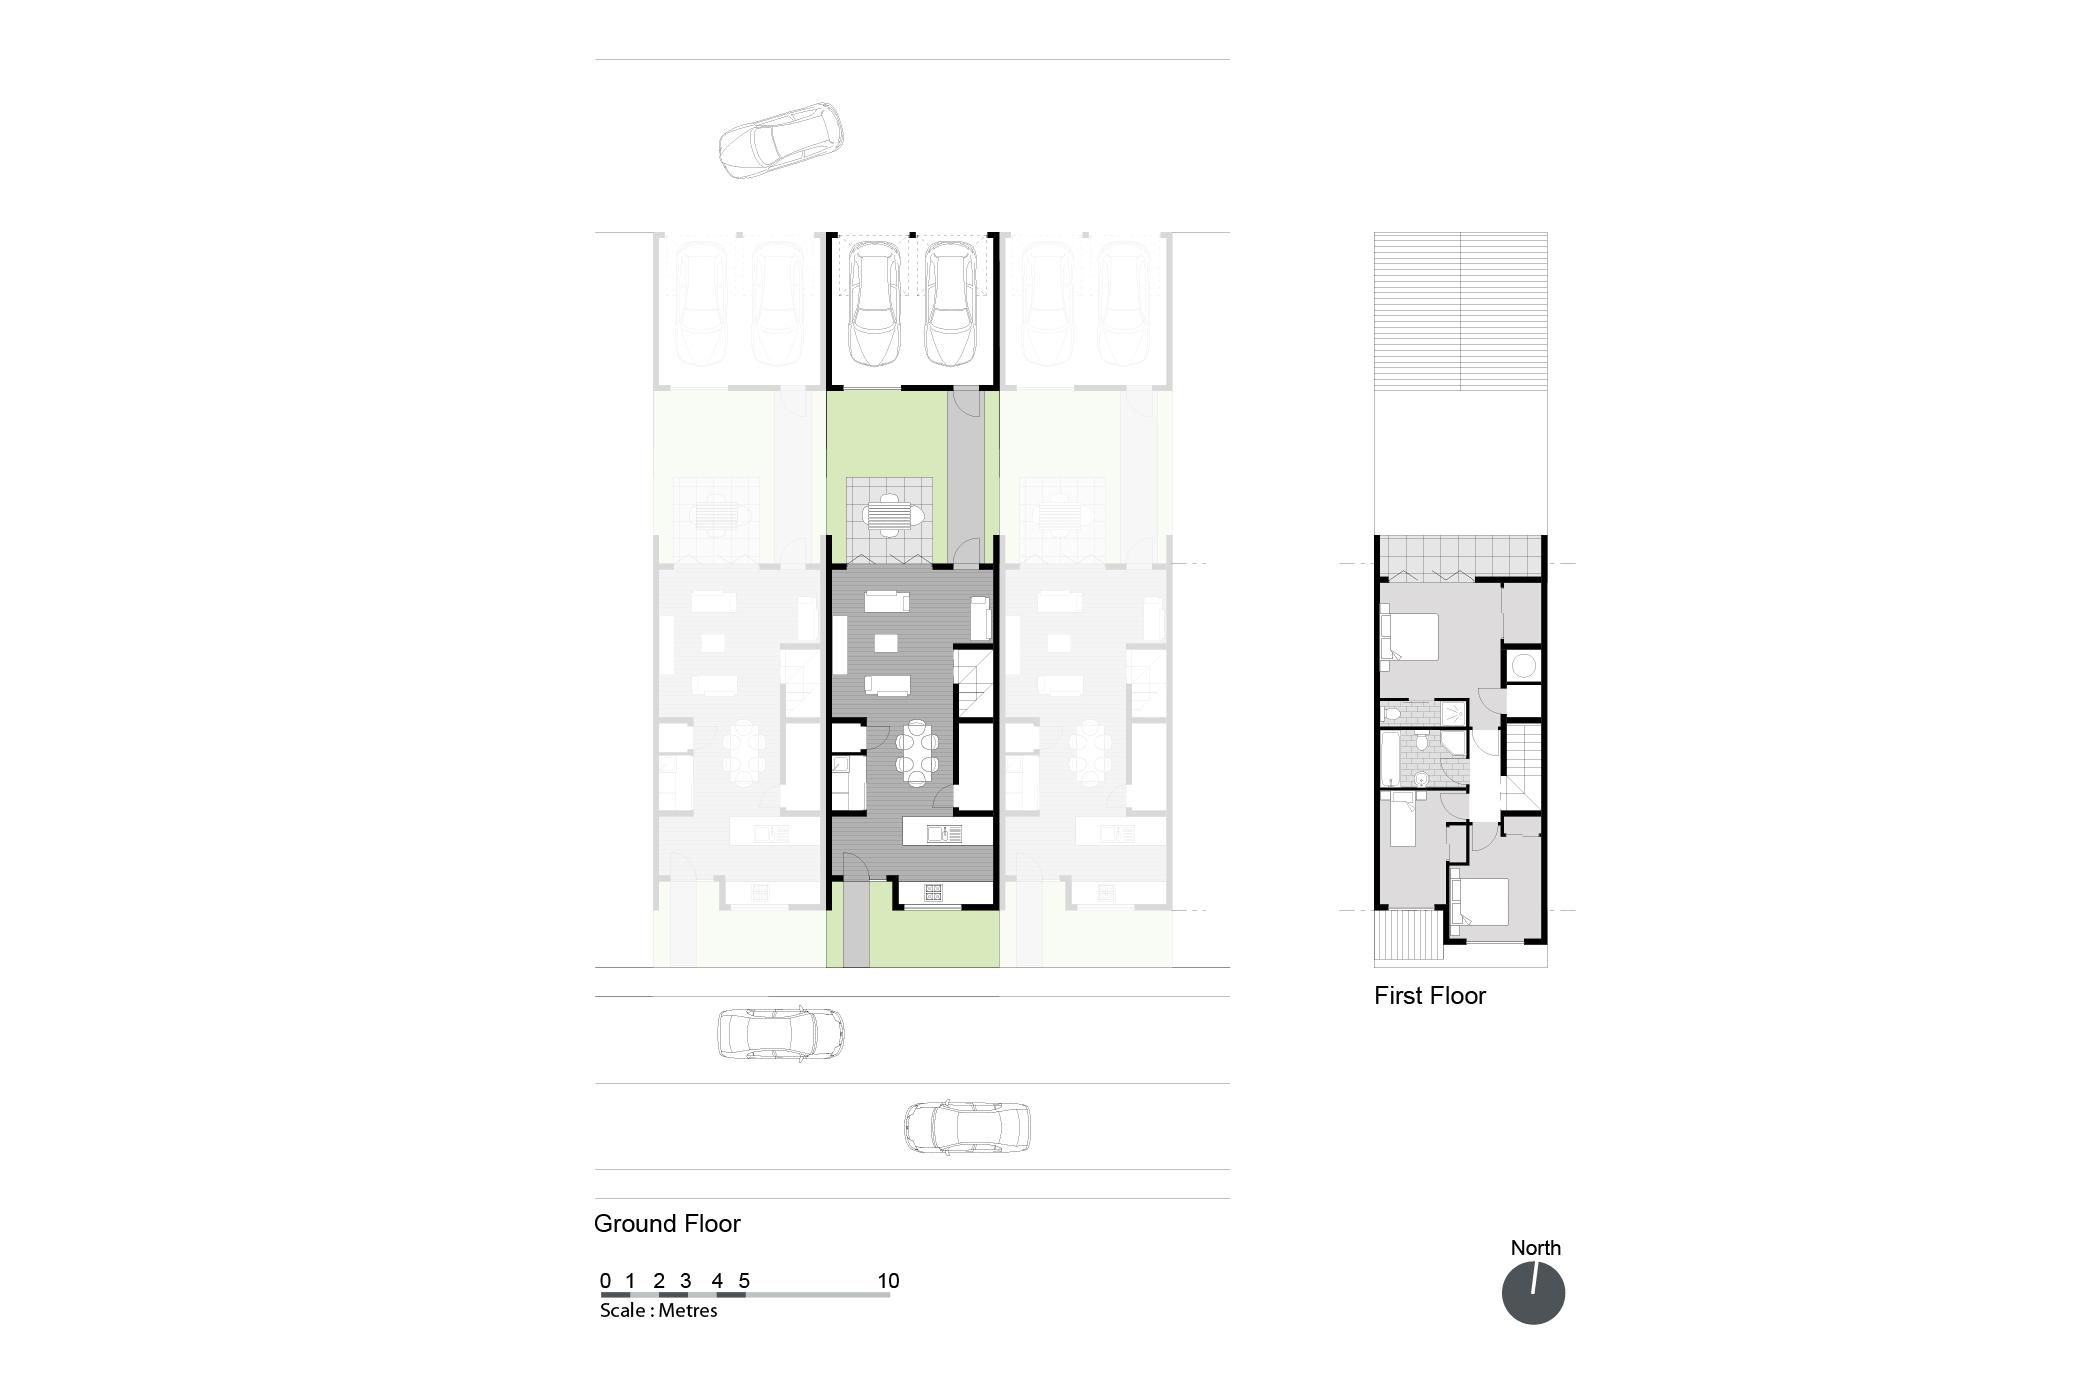 Rear garage house plans sydney